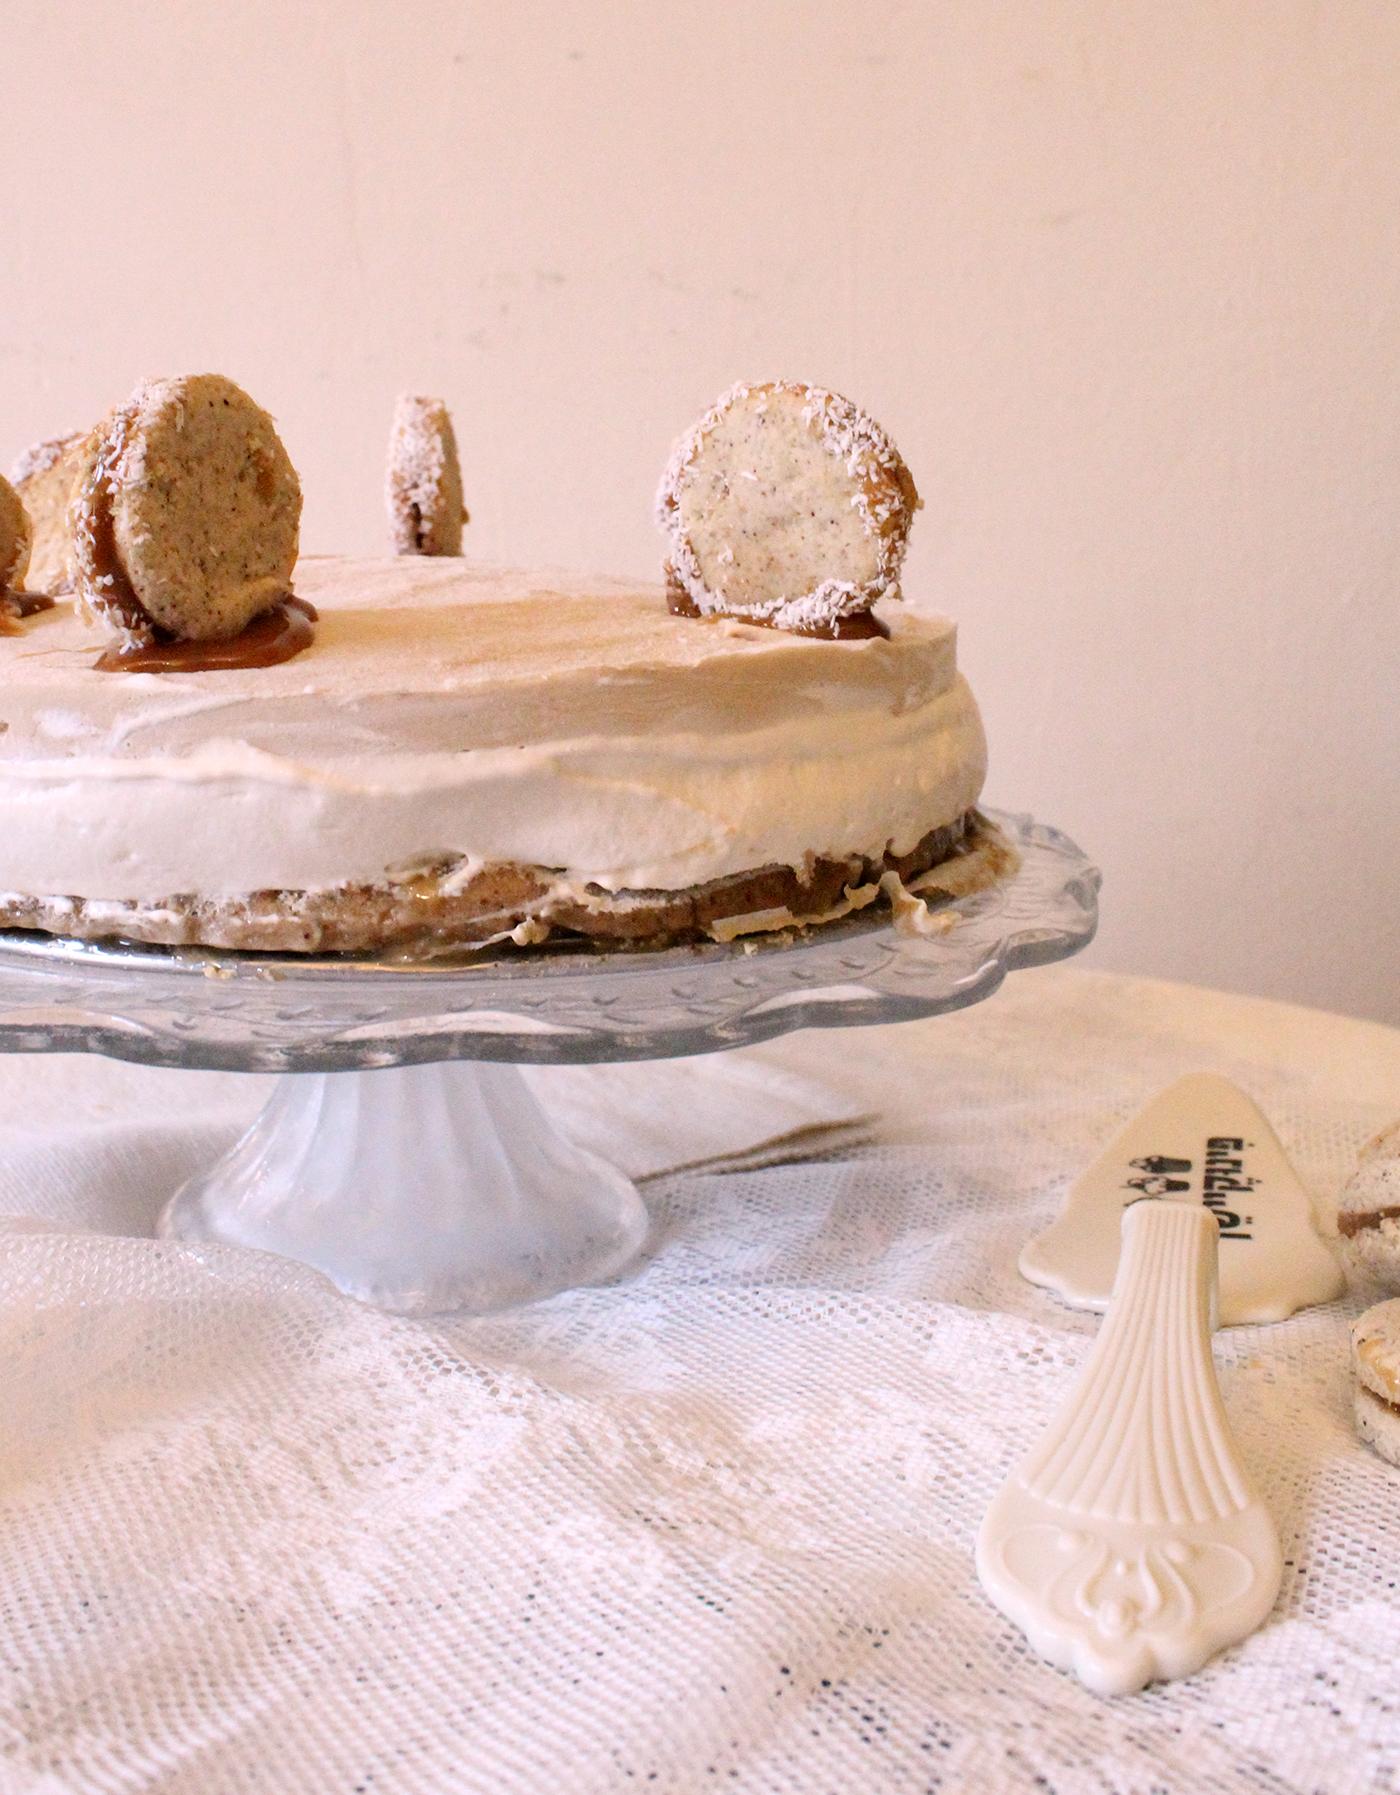 IMG 7778 - עוגת מוס על בסיס אלפחורס